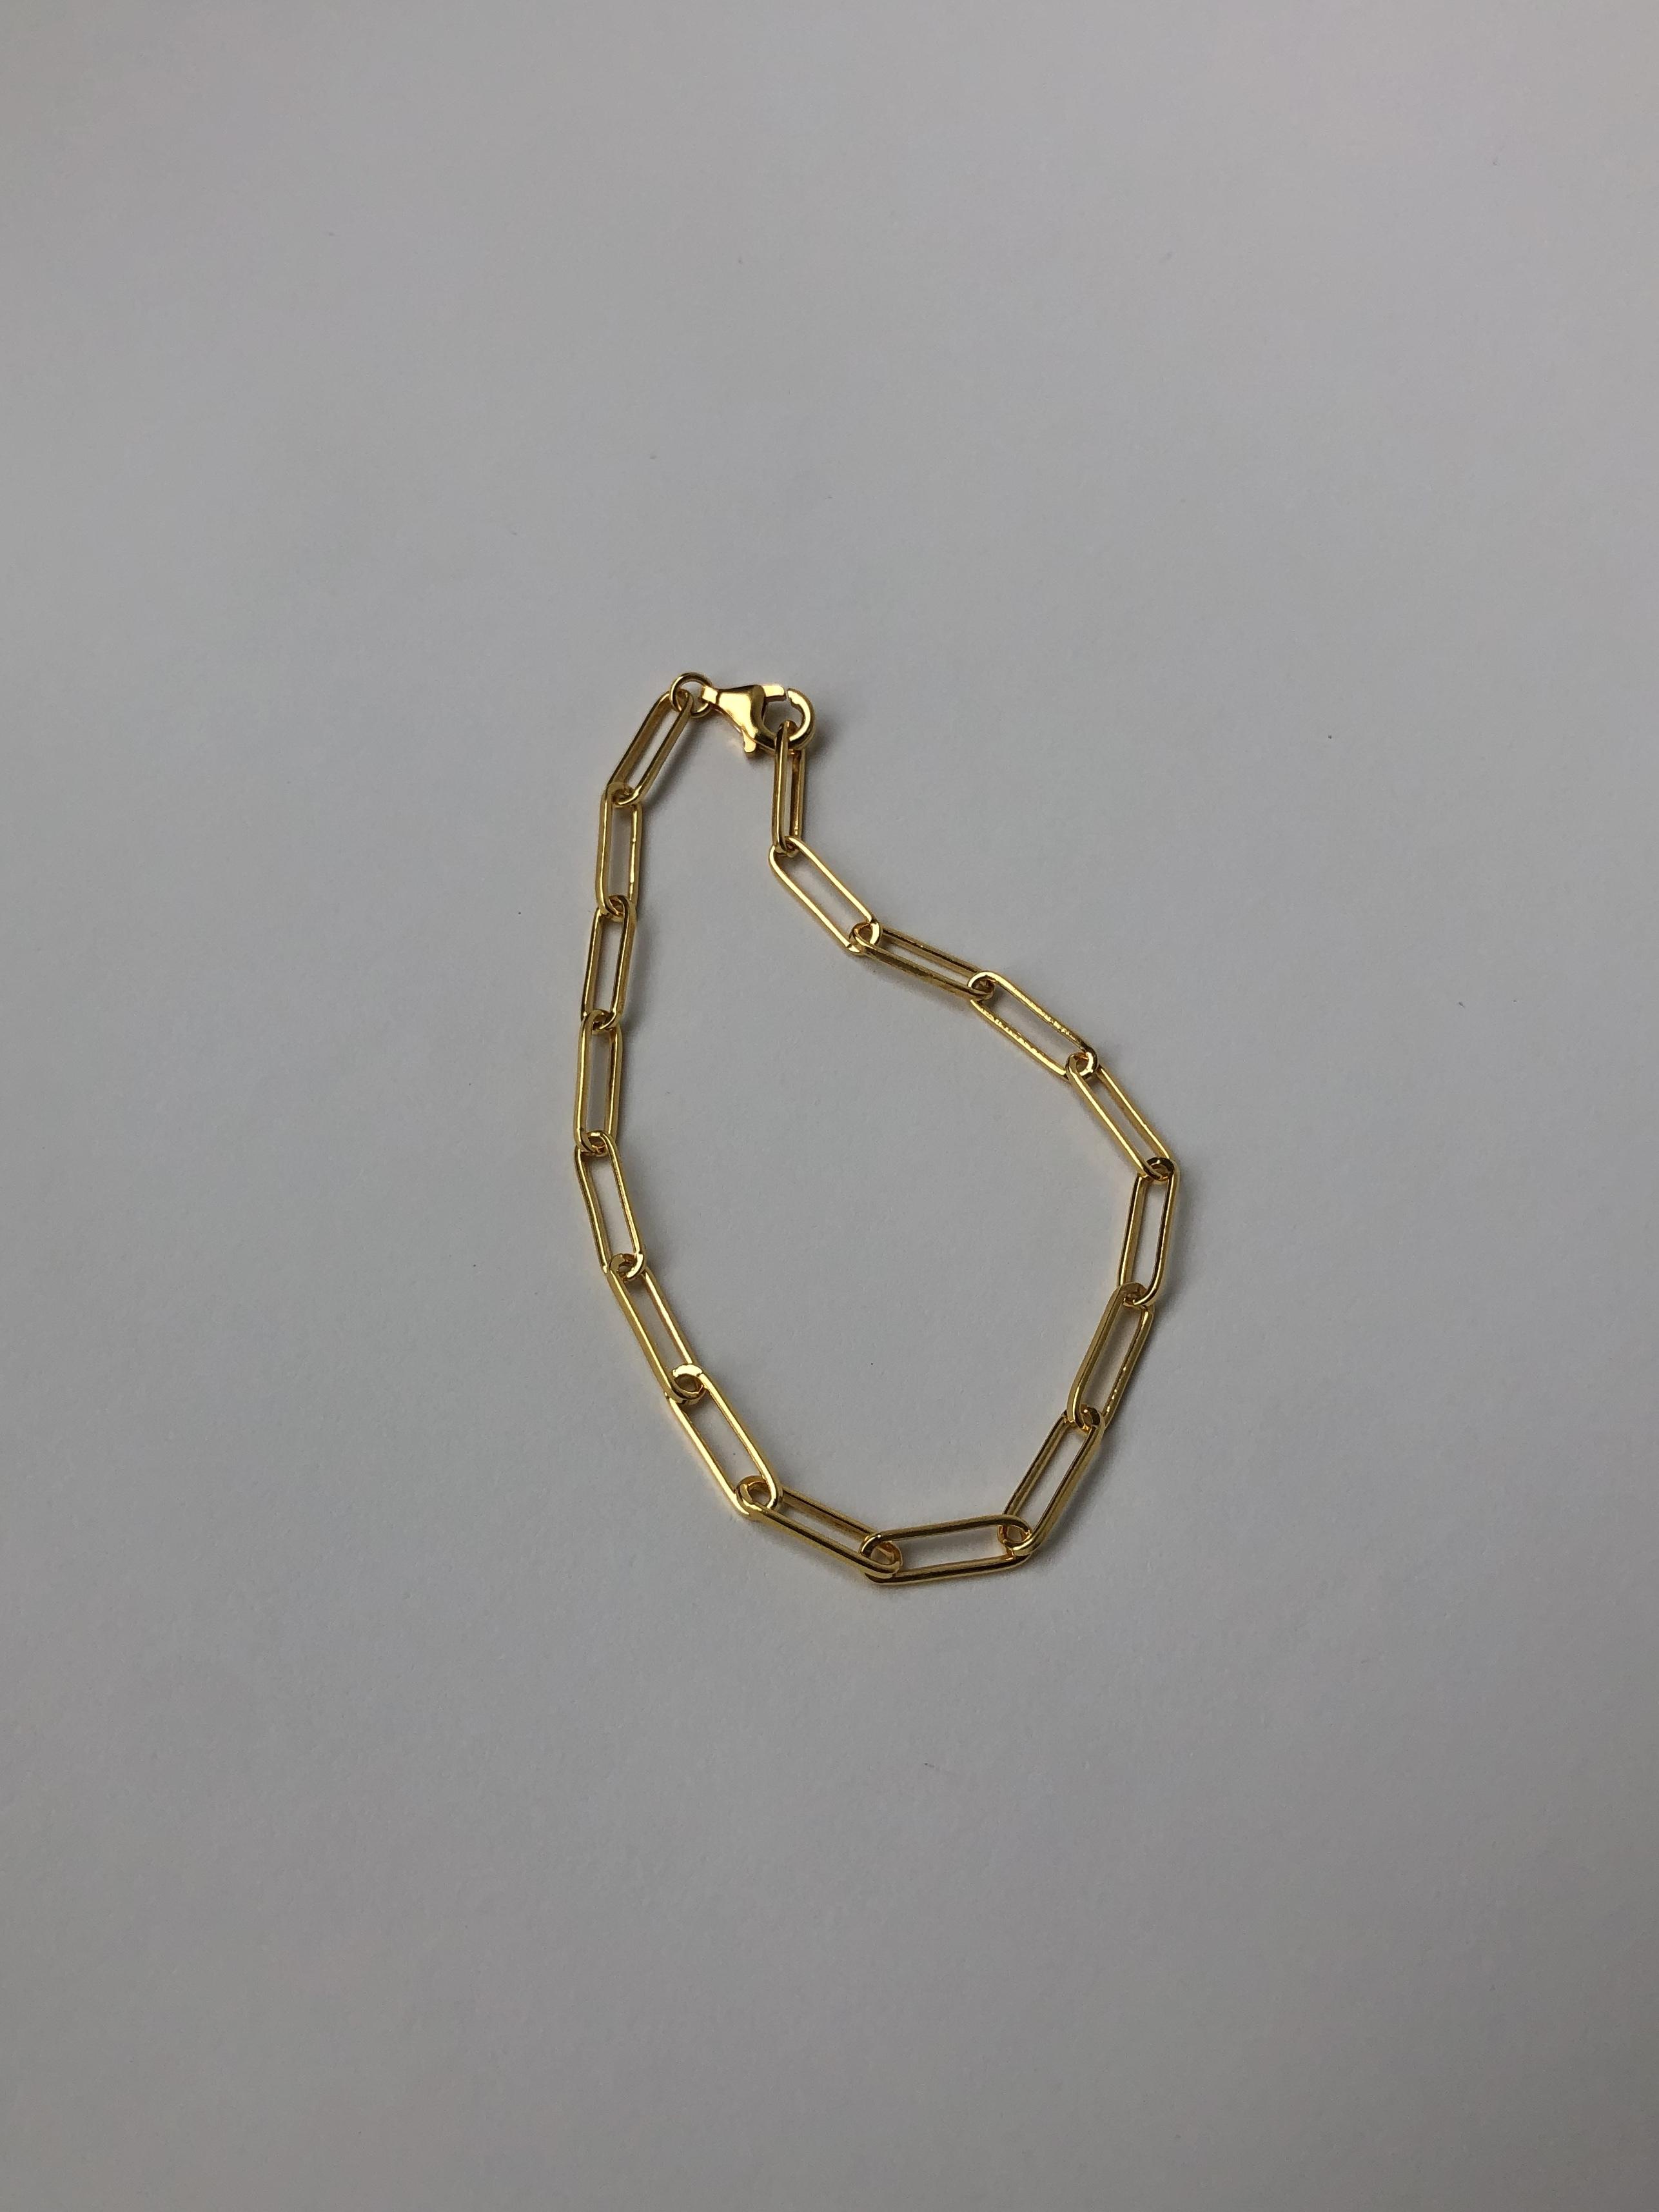 adjustable square chain bracelet gold(再入荷)